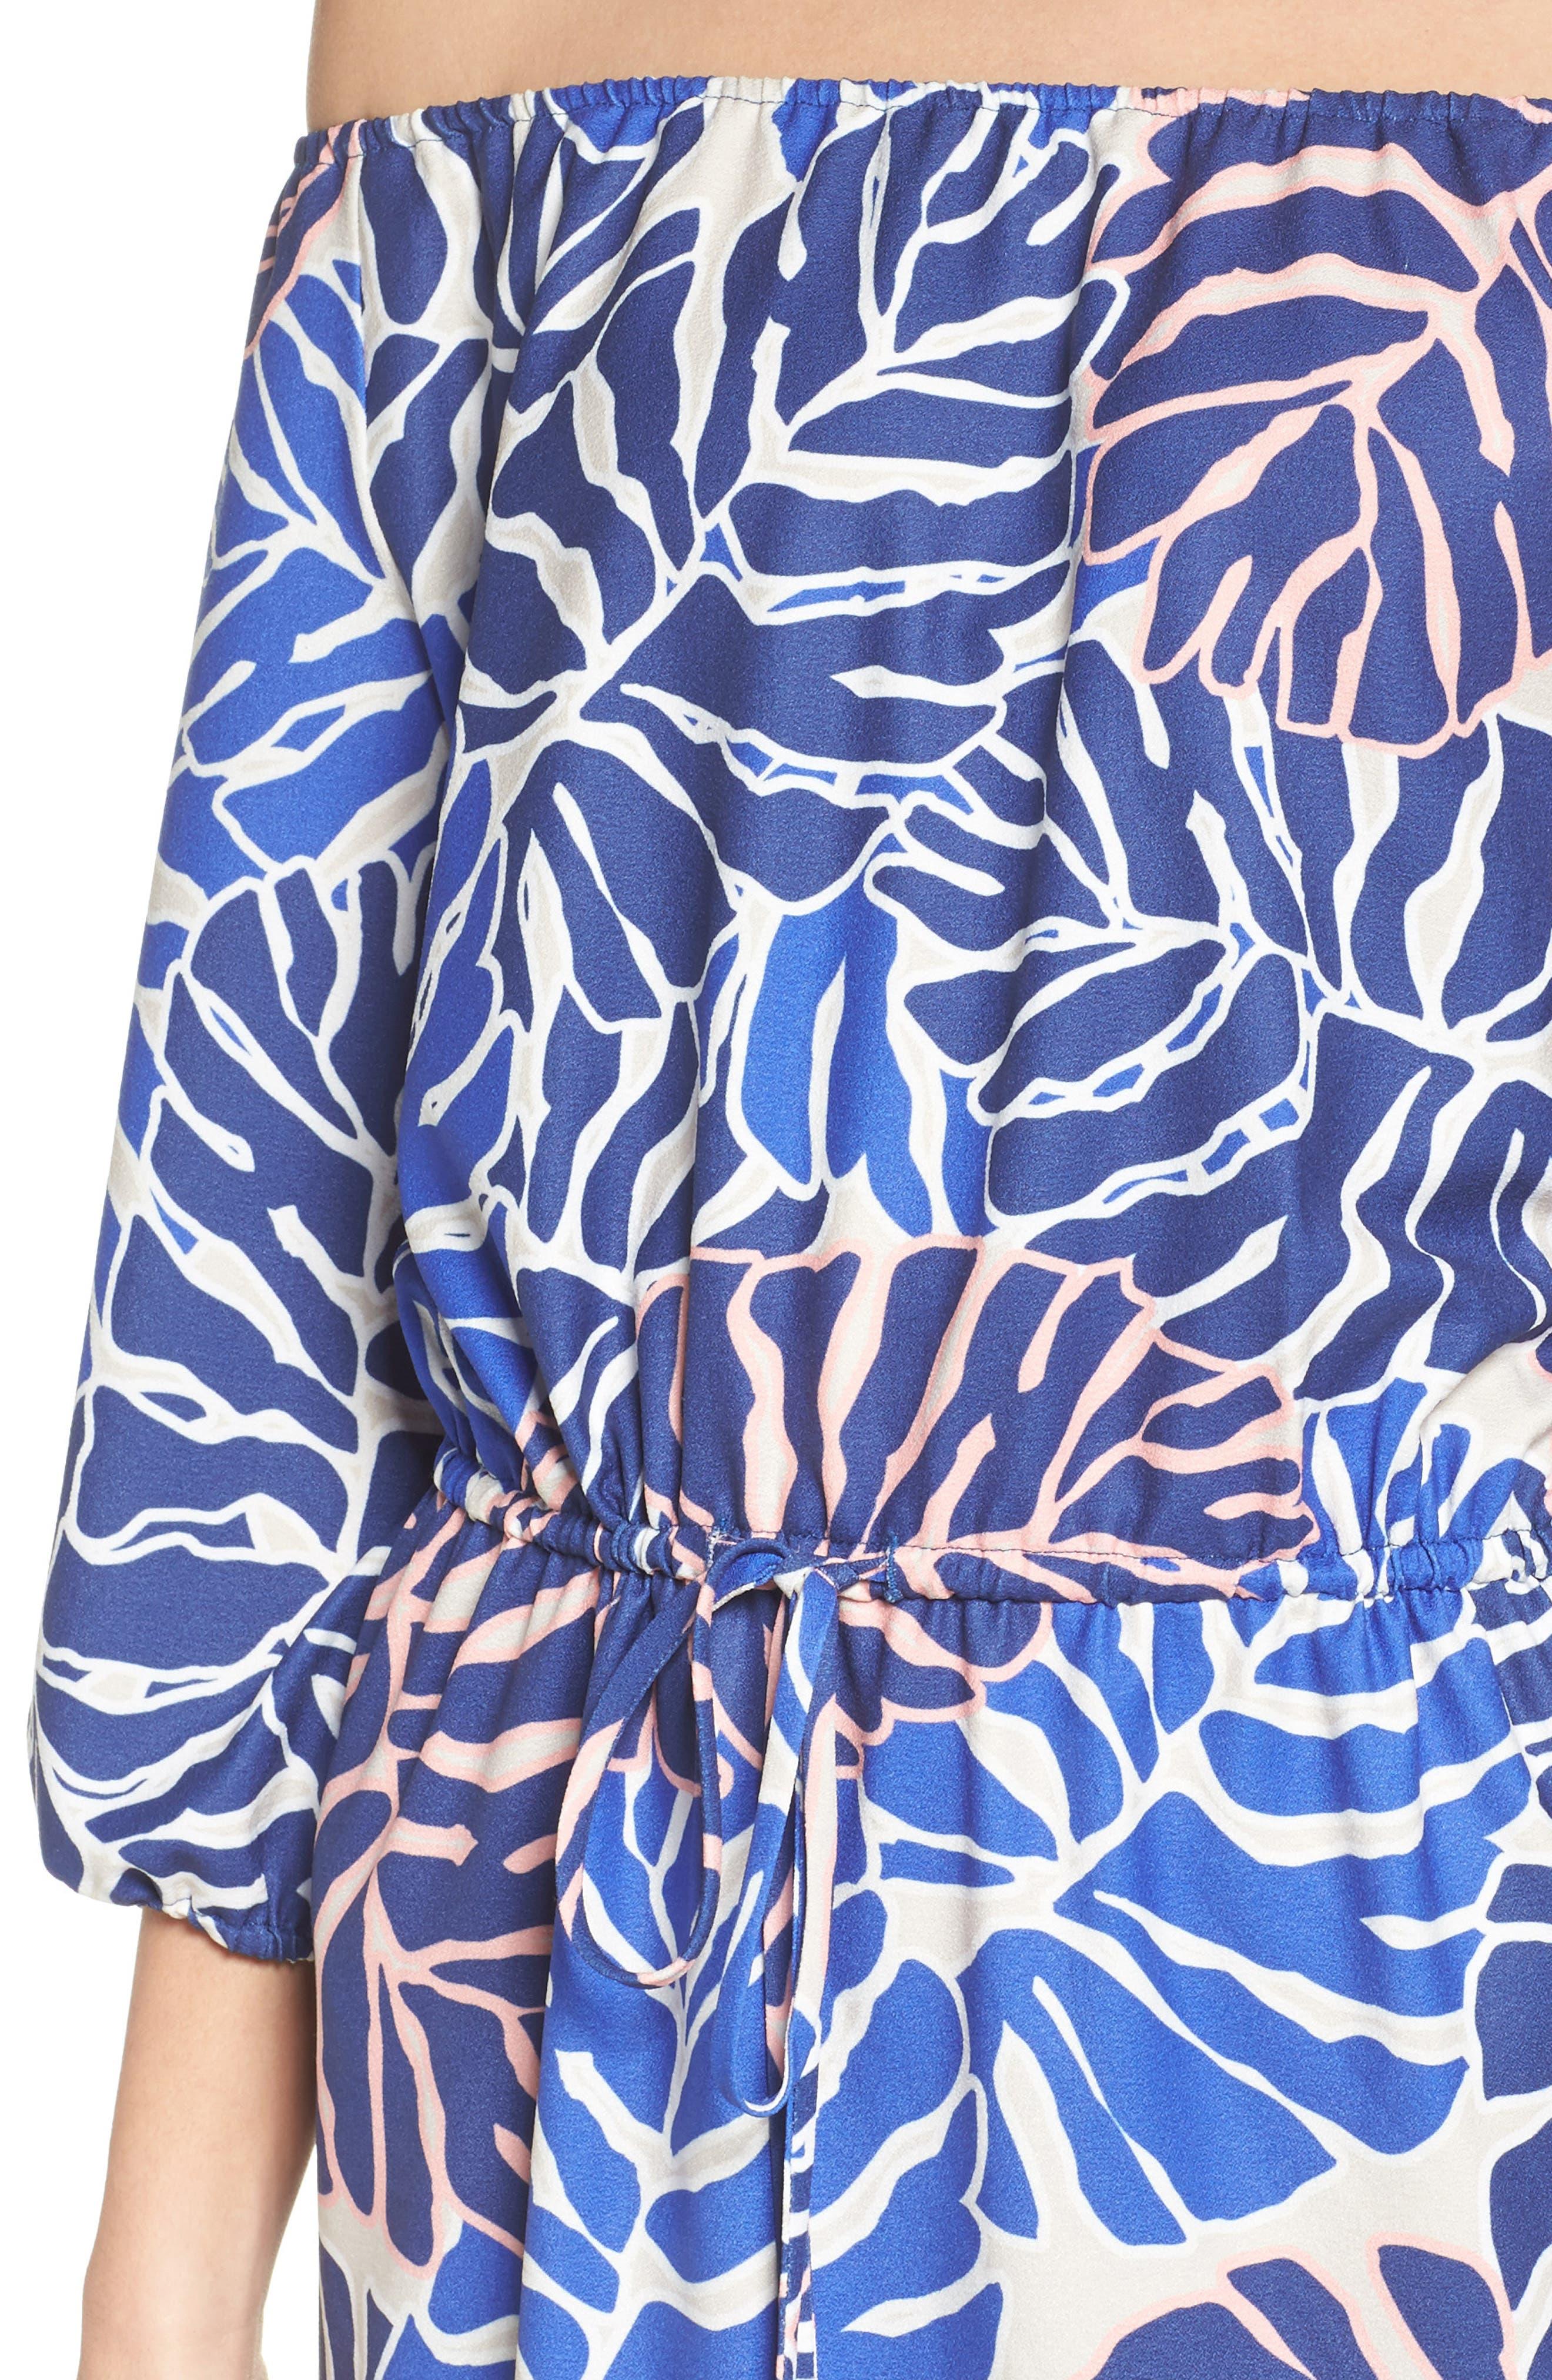 Leilani Off the Shoulder Dress,                             Alternate thumbnail 4, color,                             Palm Print